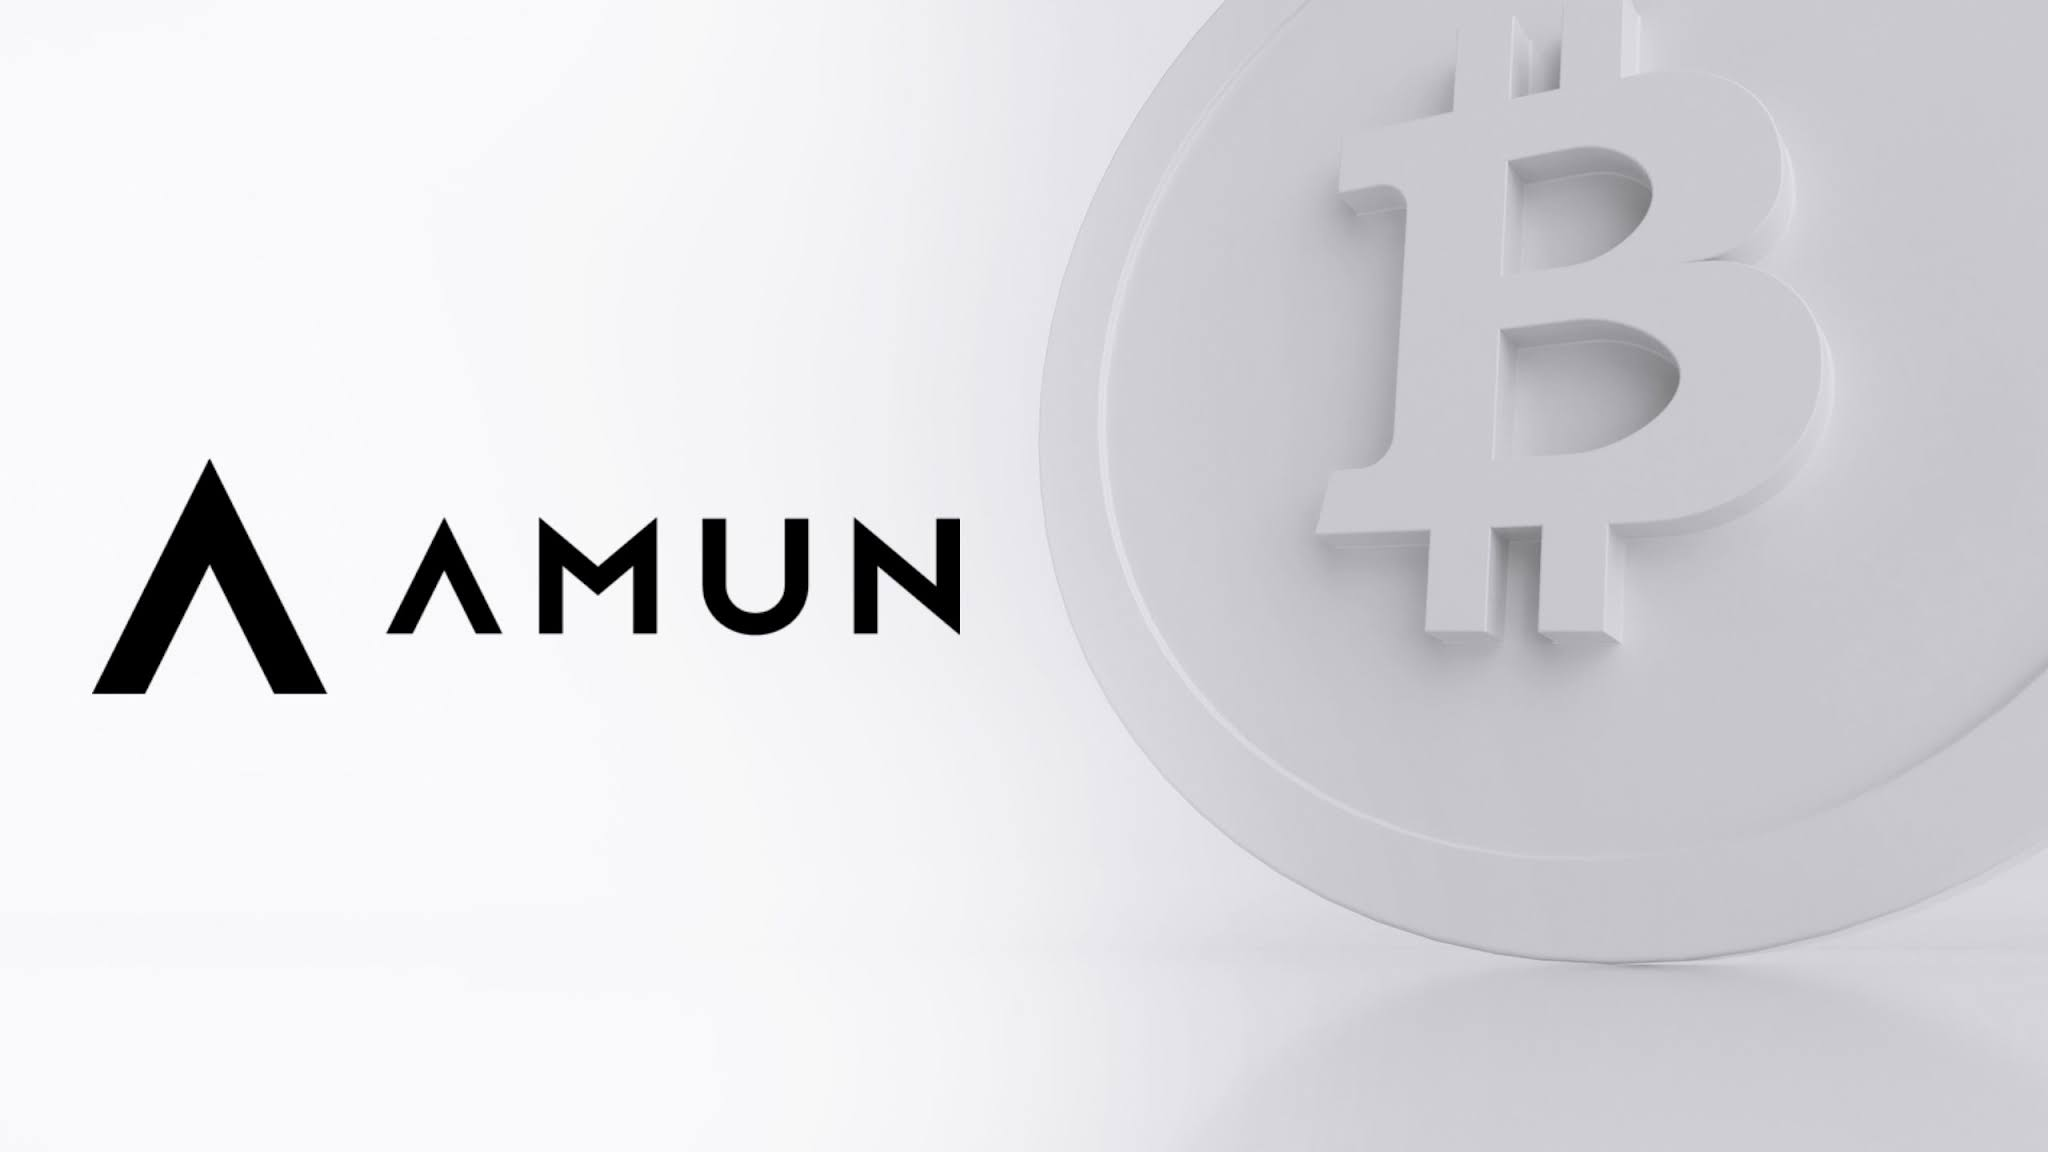 Amun Limited